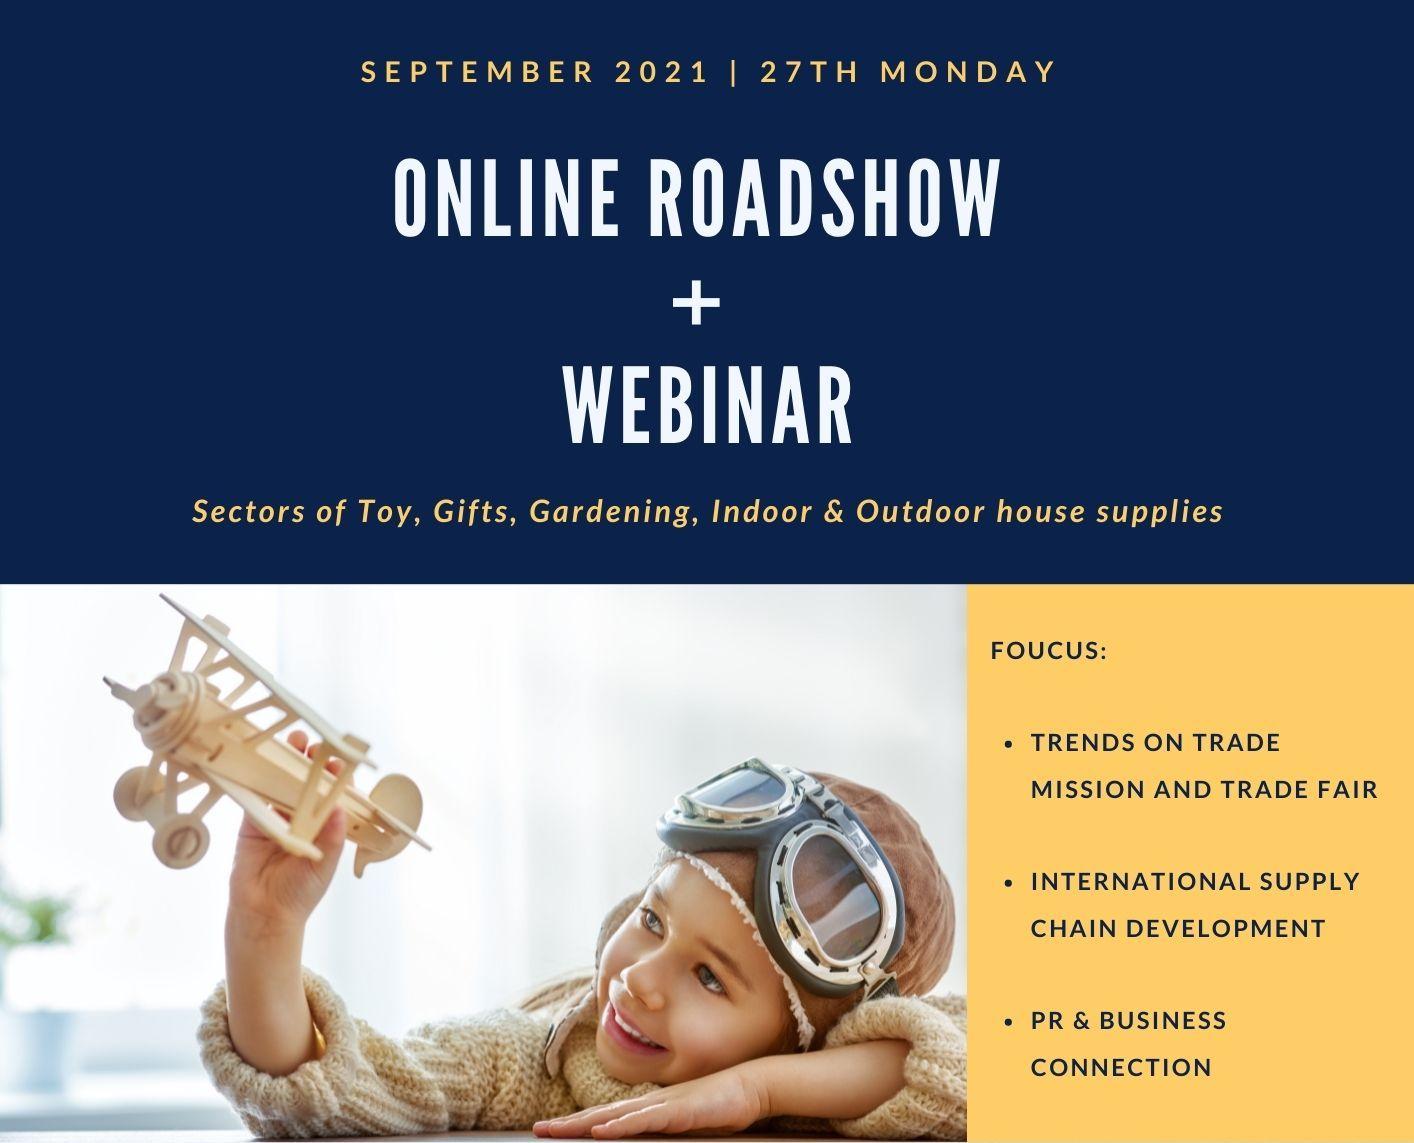 Trends: International Trade Fair / Trade Mission & International Sales Channel Establishment